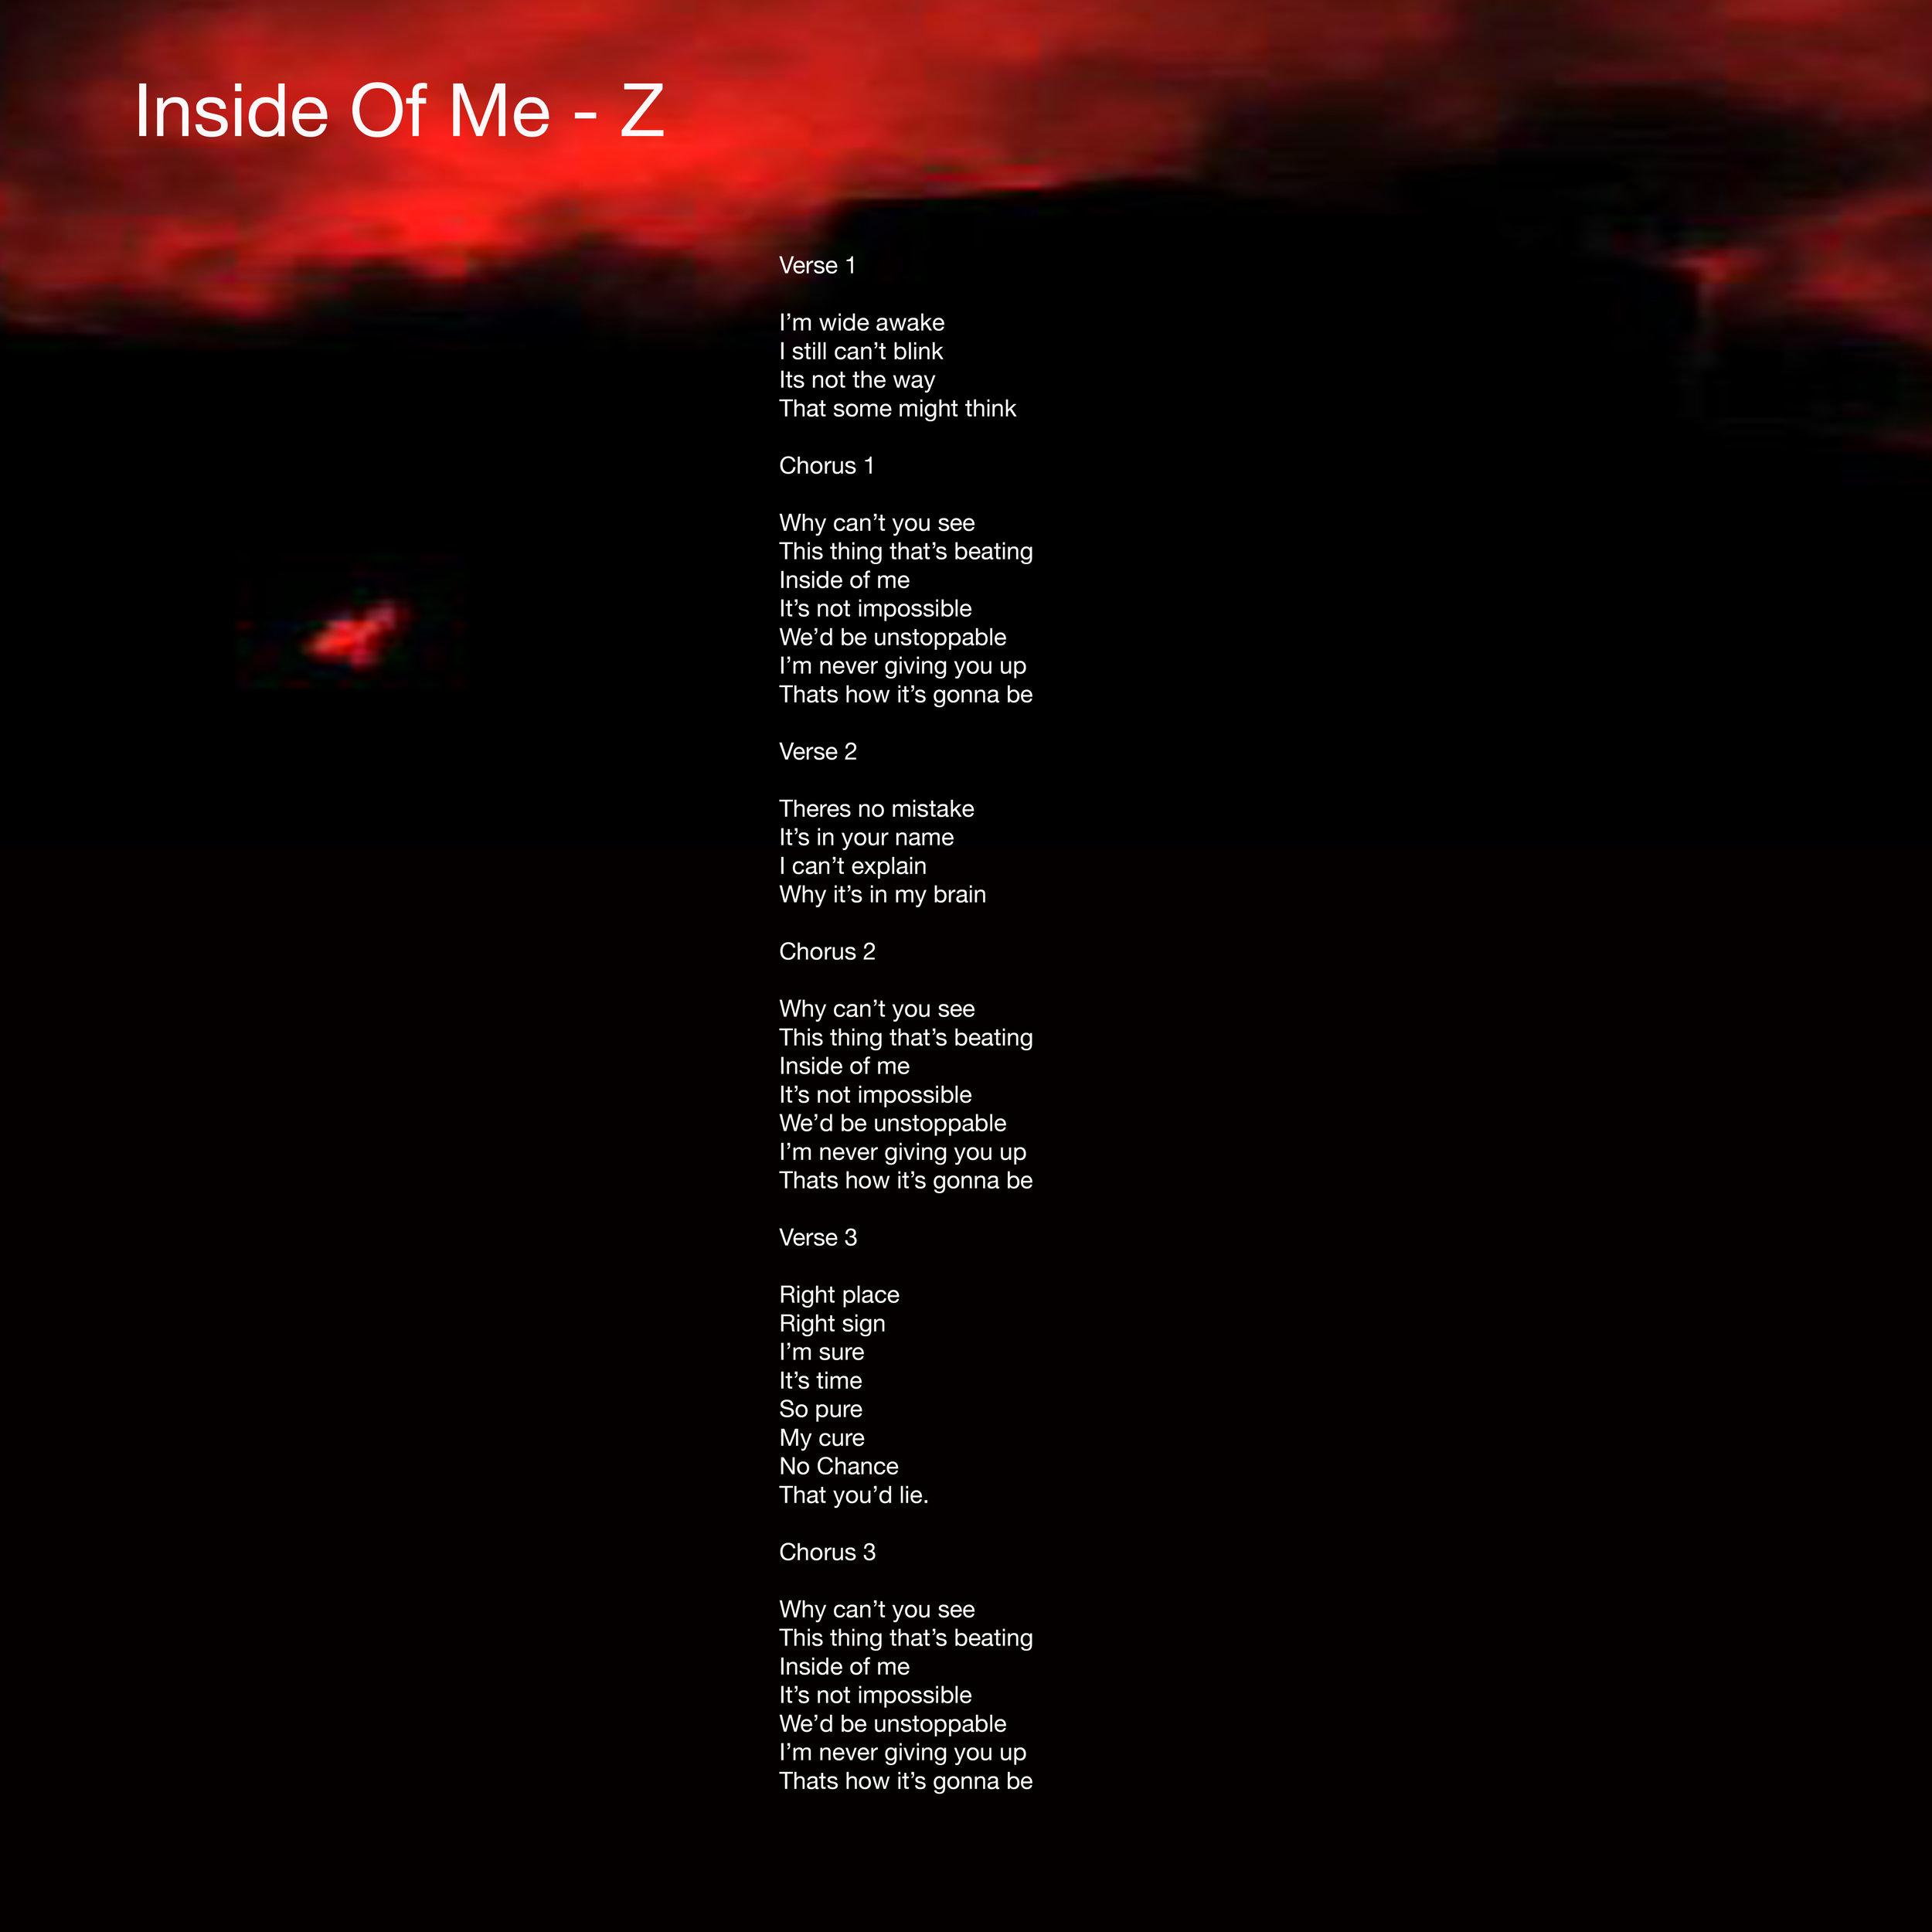 Inside-Of-Me-Z-Lyric-ArtDX.jpg